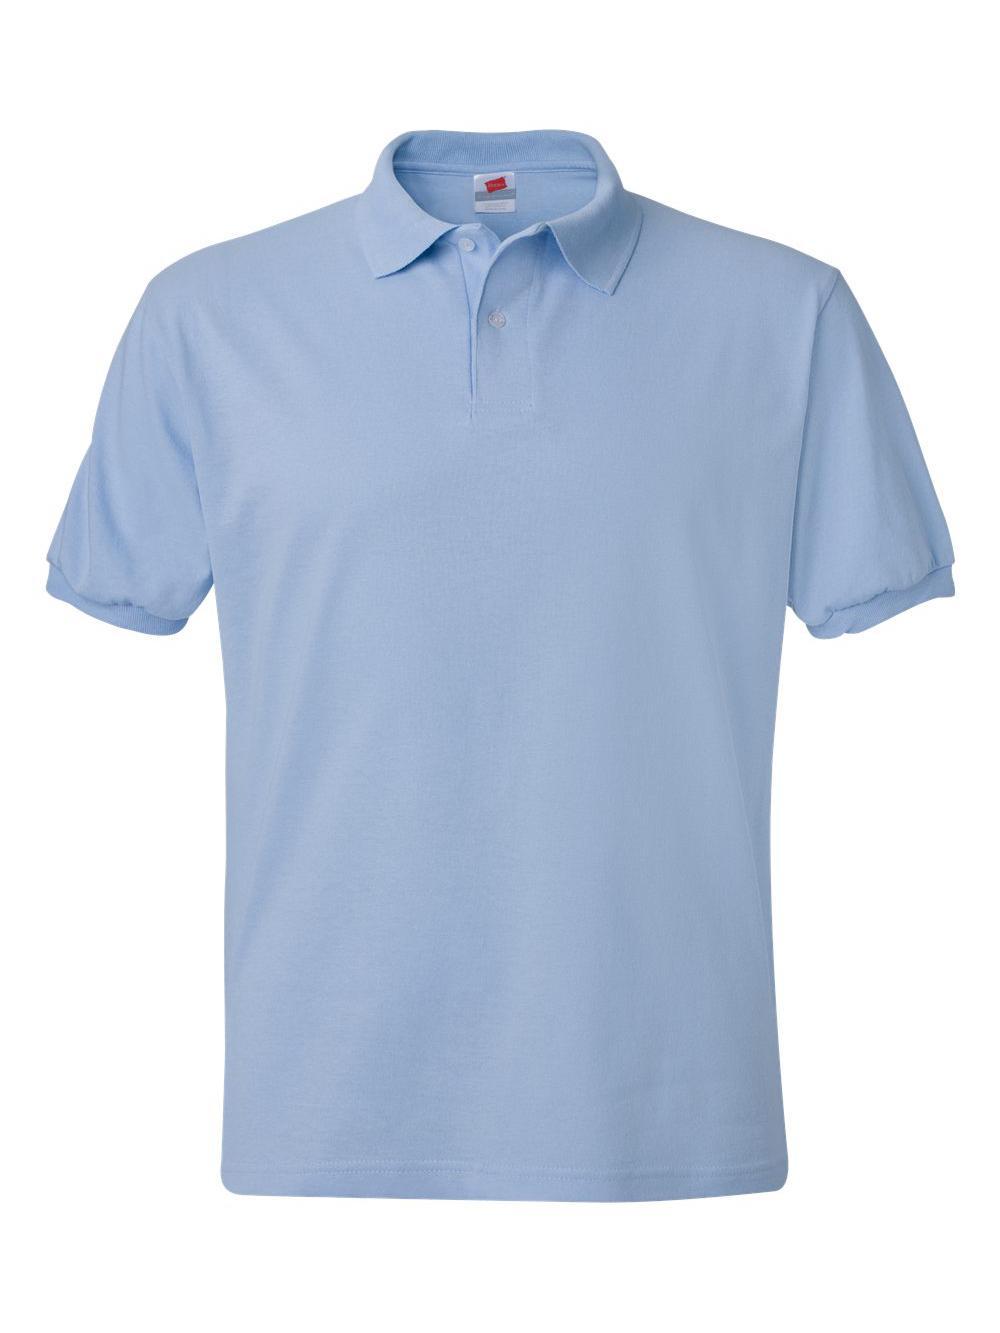 Hanes-Ecosmart-Jersey-Sport-Shirt-054X thumbnail 24